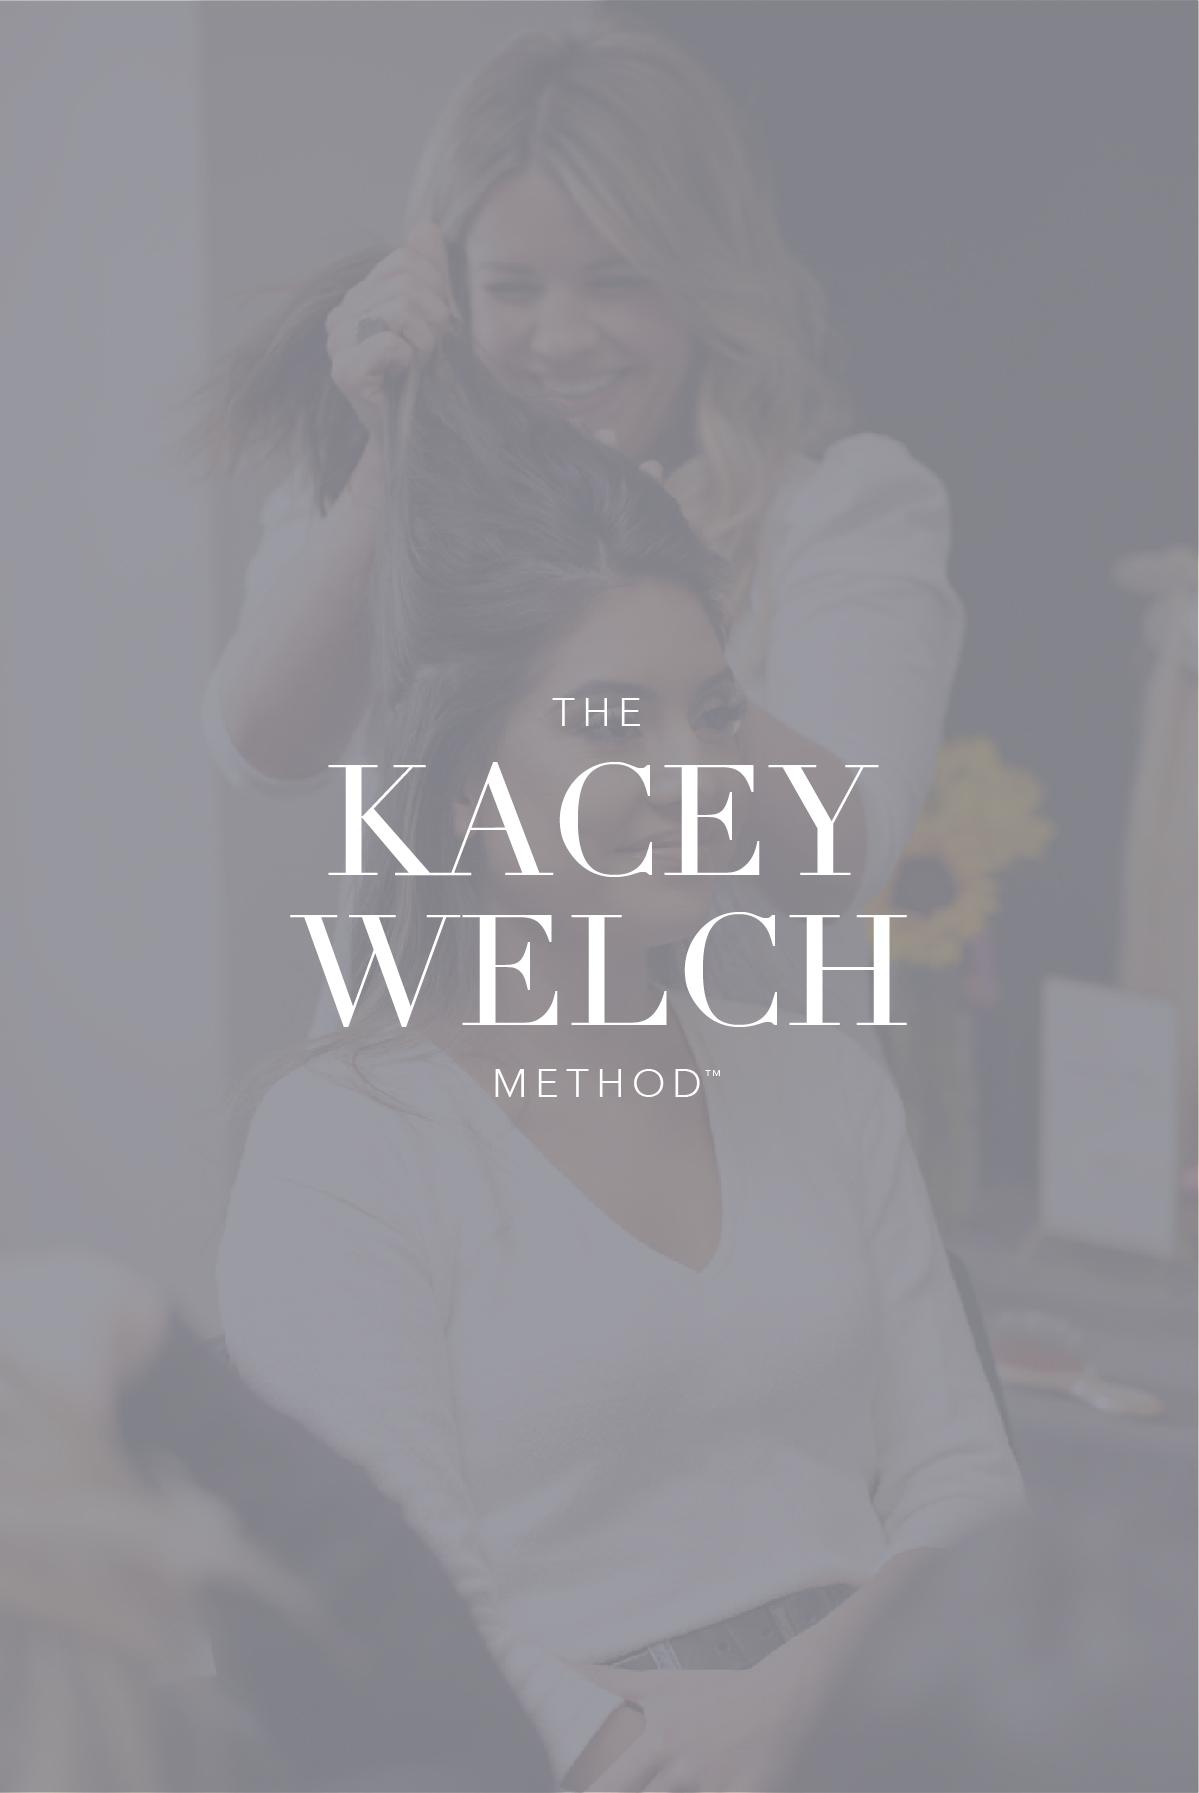 Rachelle Roberson - Las Vegas, NevadaCONTACT ME